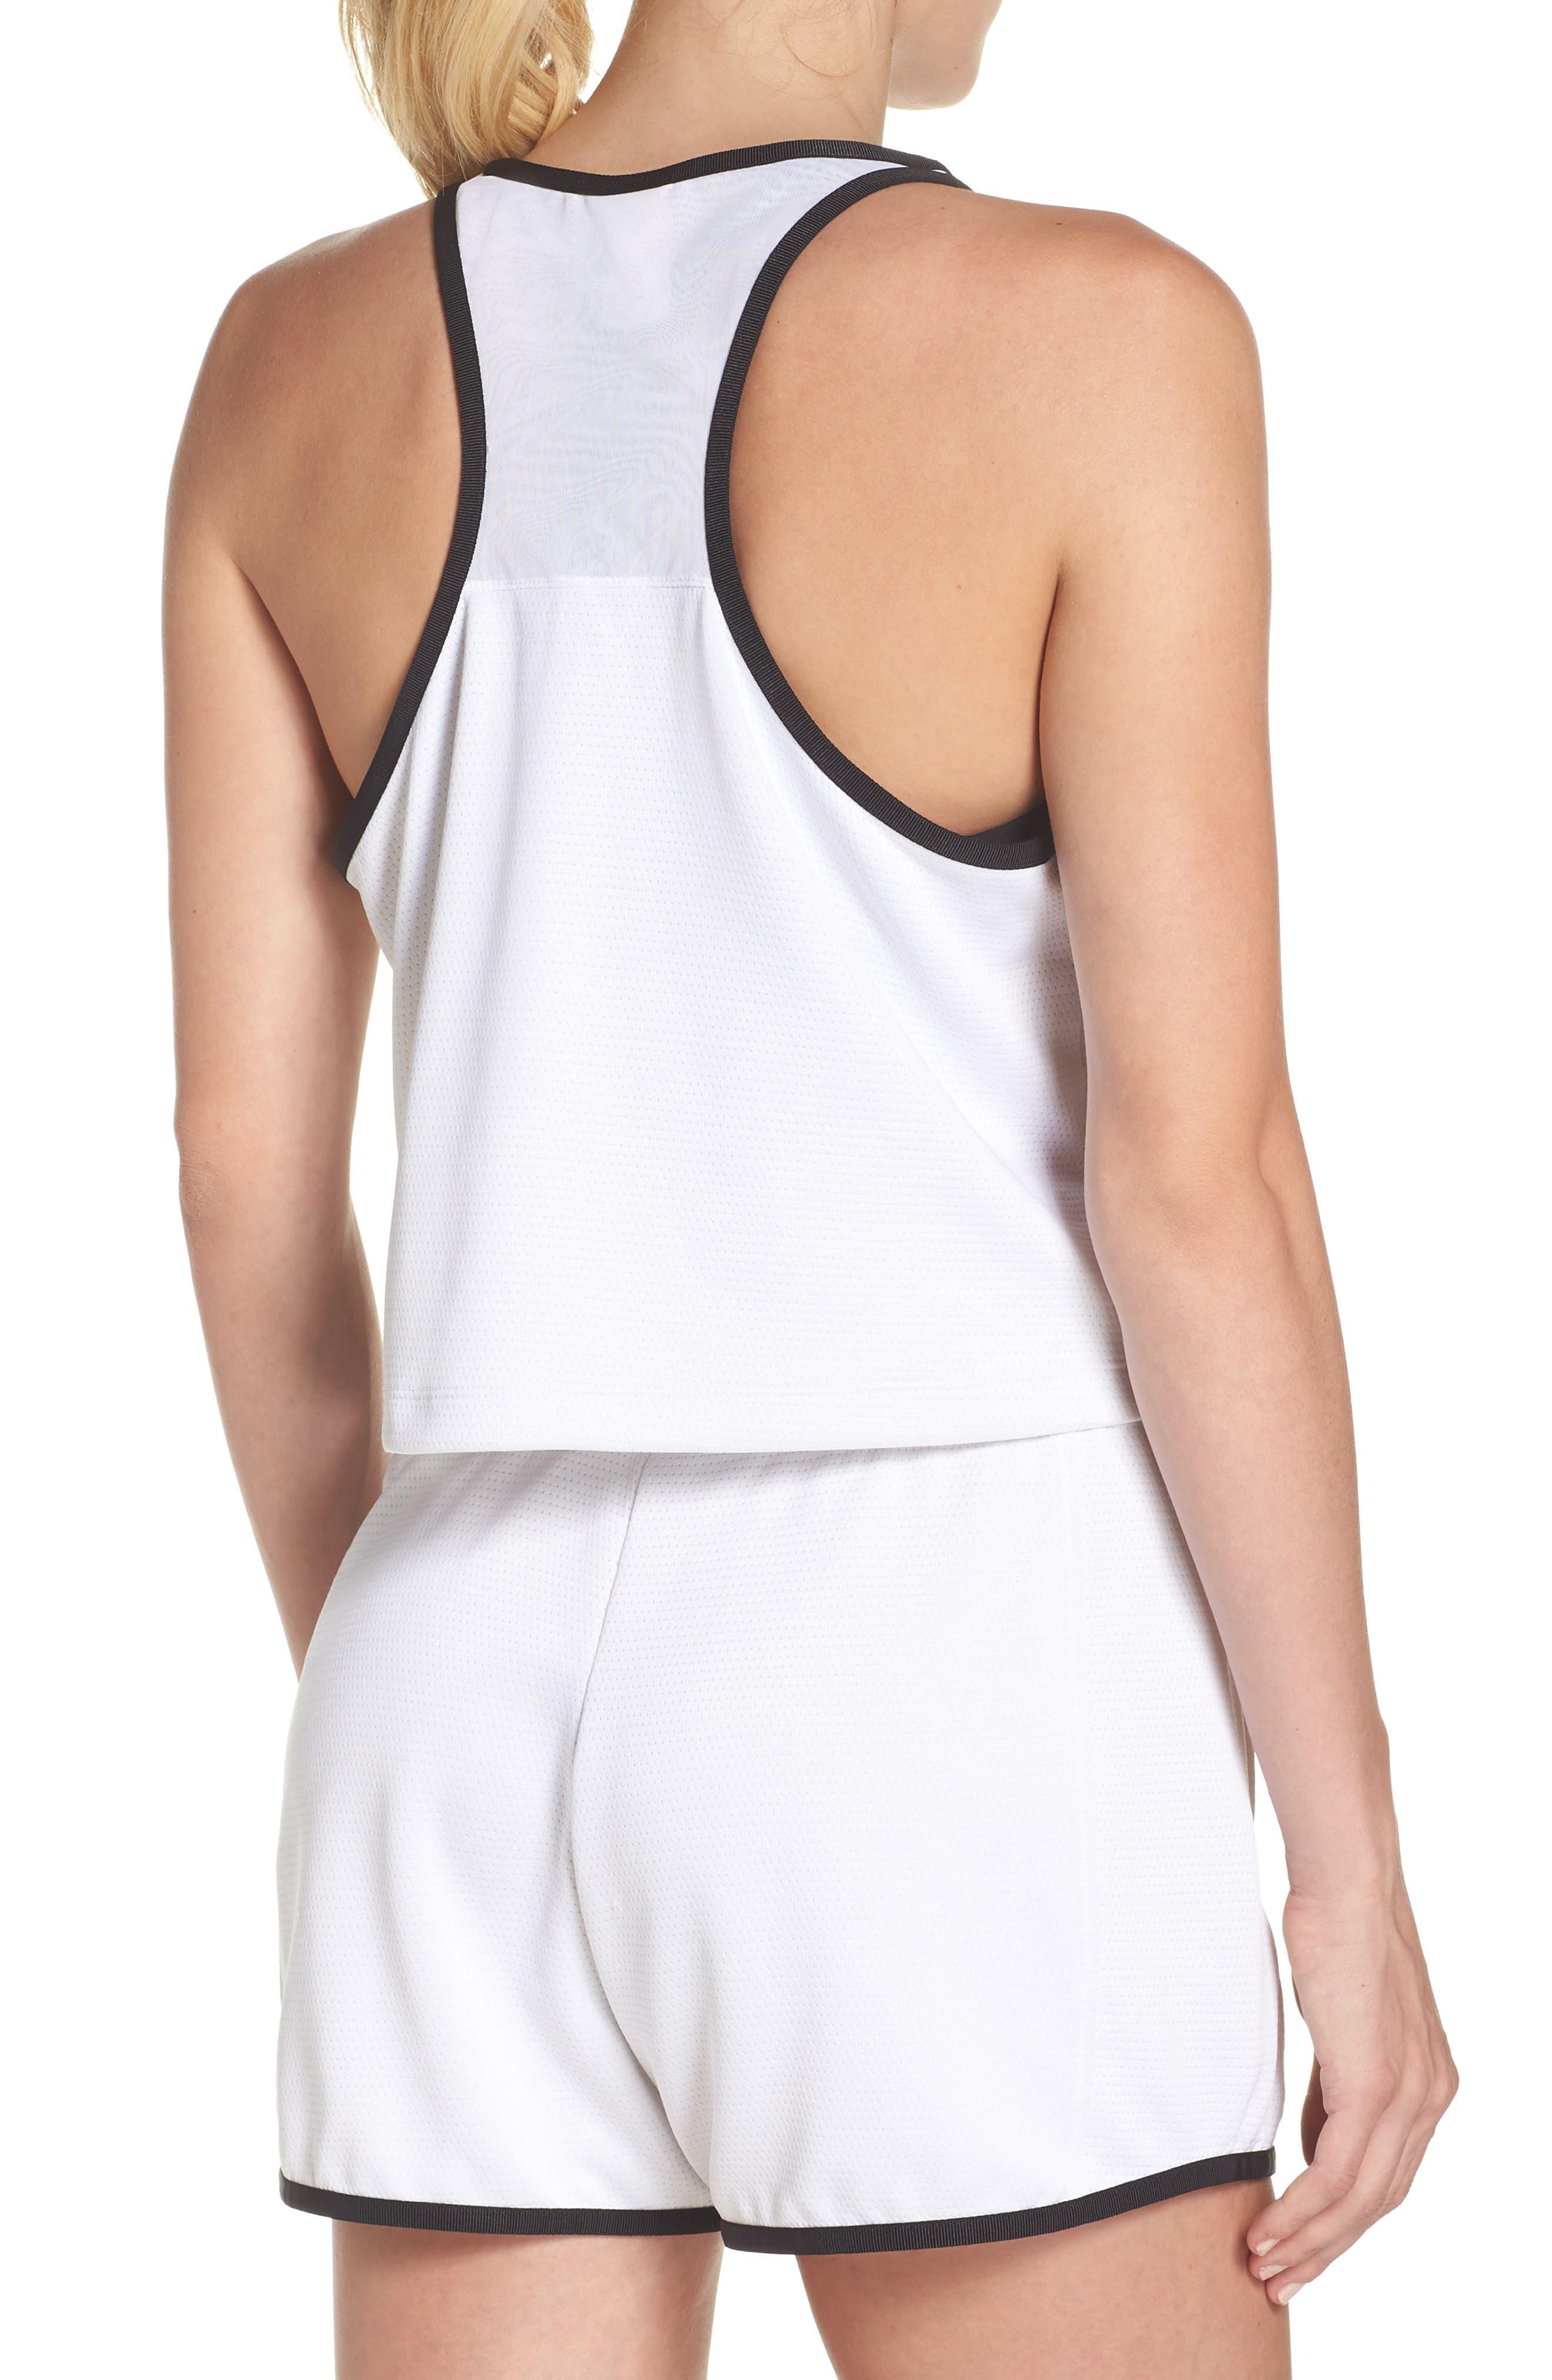 Sportswear Teched Out Tank,                             Alternate thumbnail 2, color,                             White/ Black